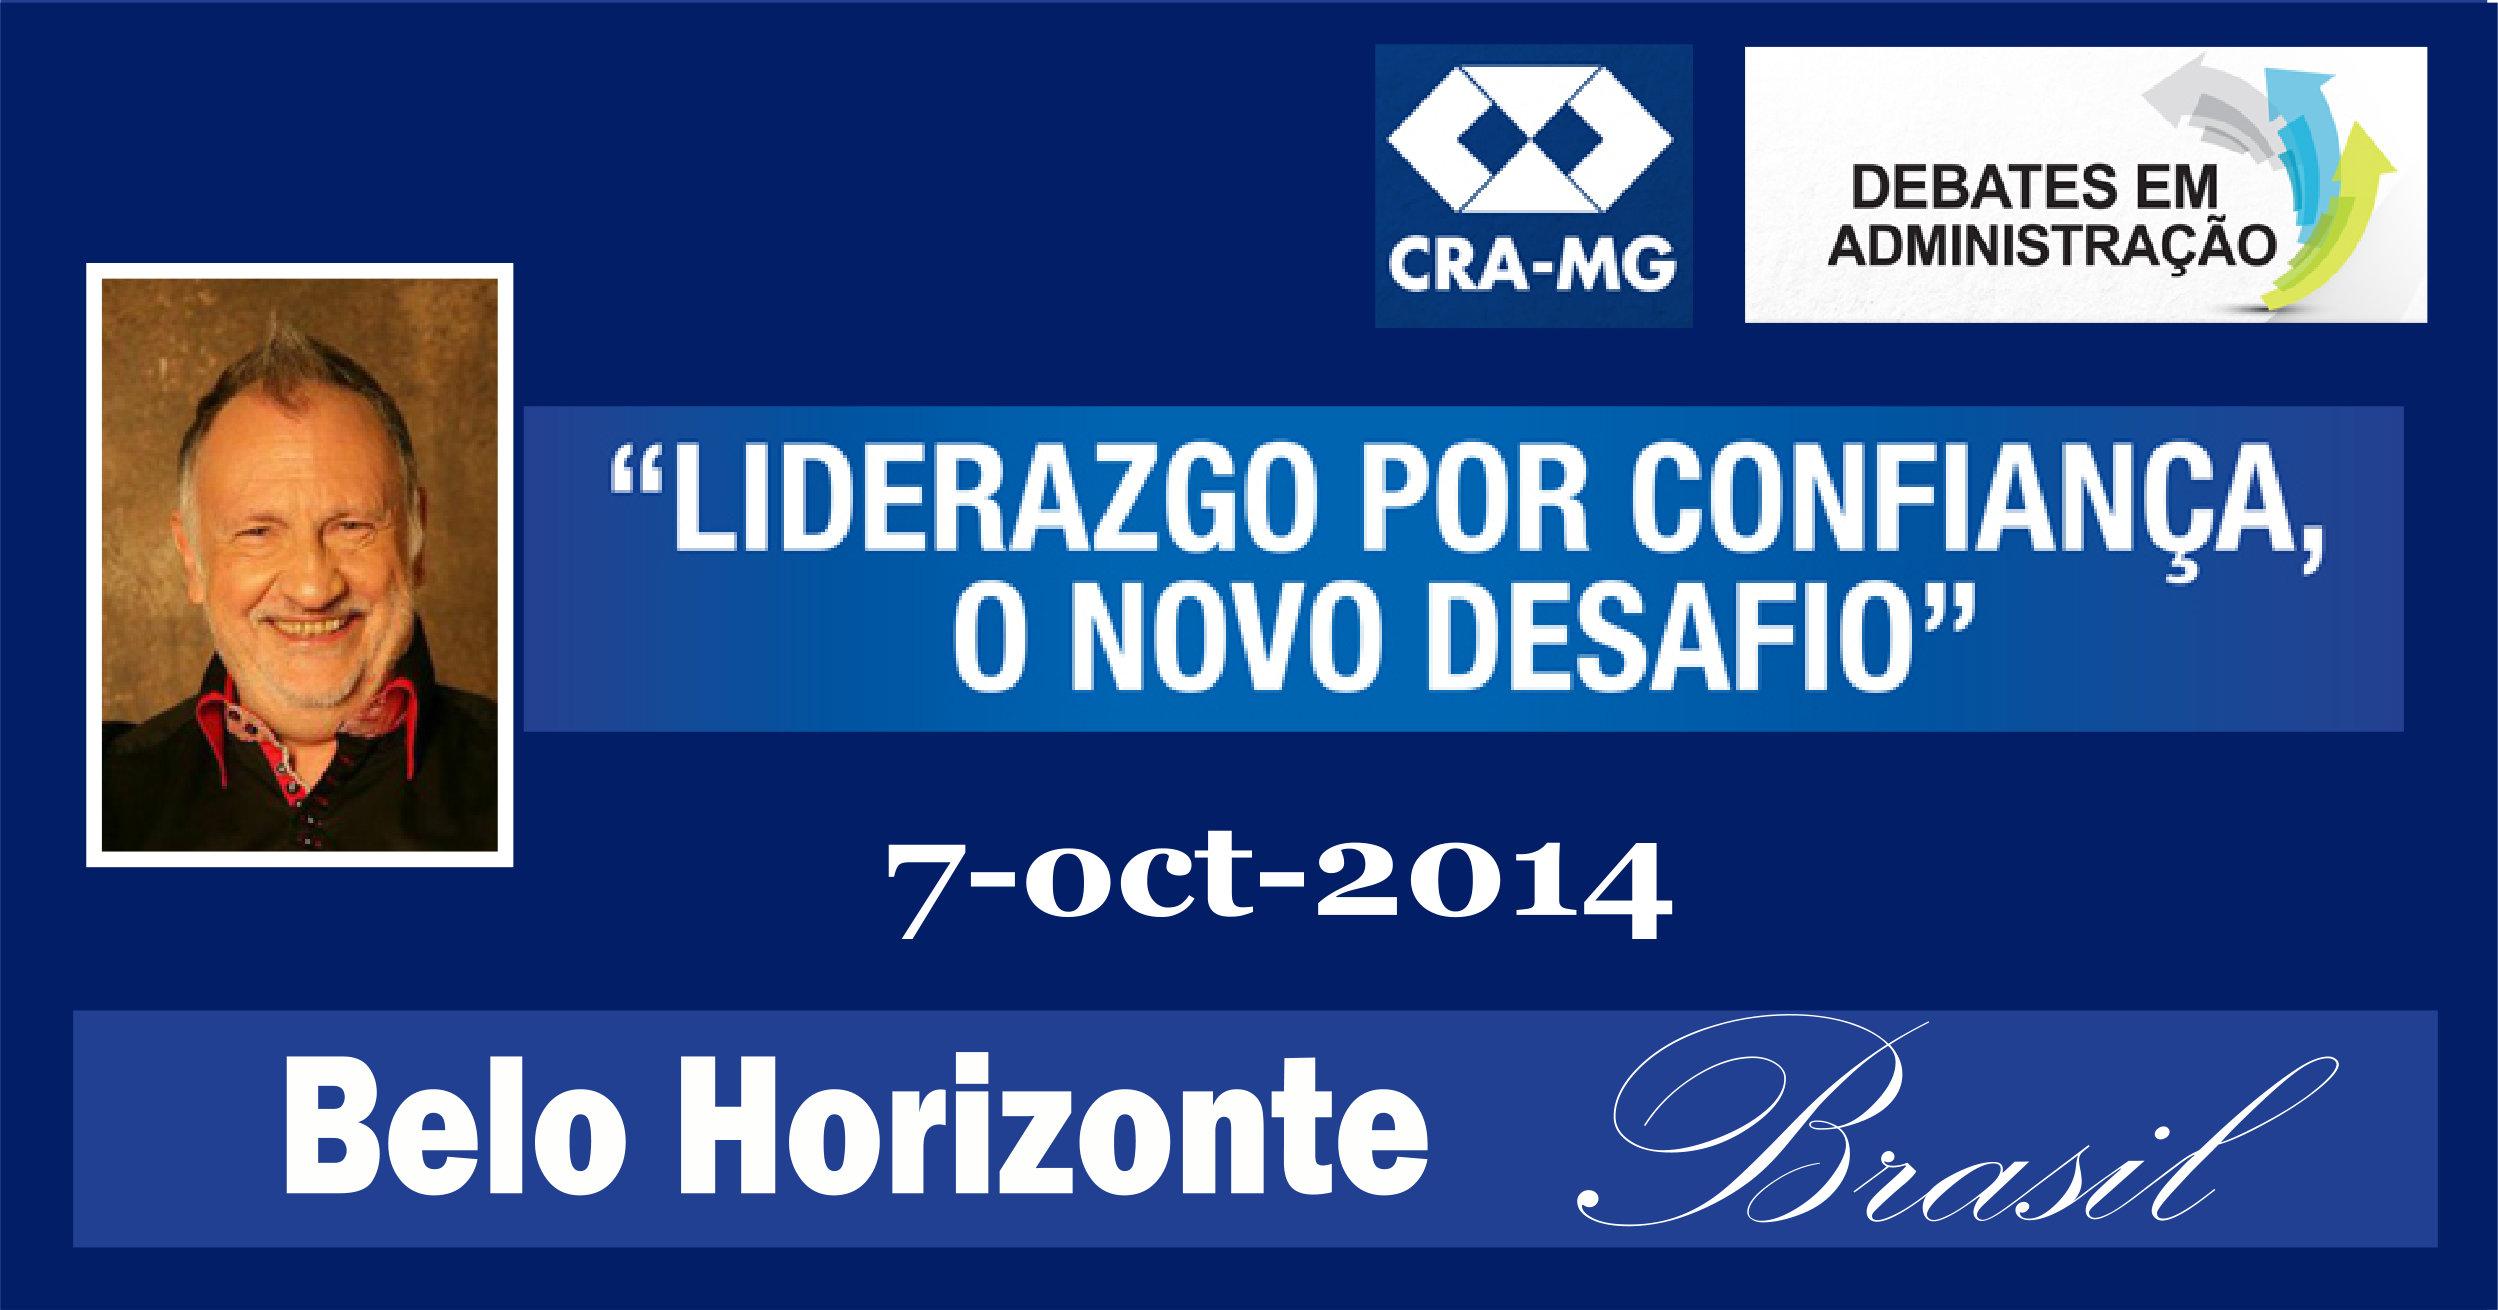 2014-10-07 BELO HORIZONTE